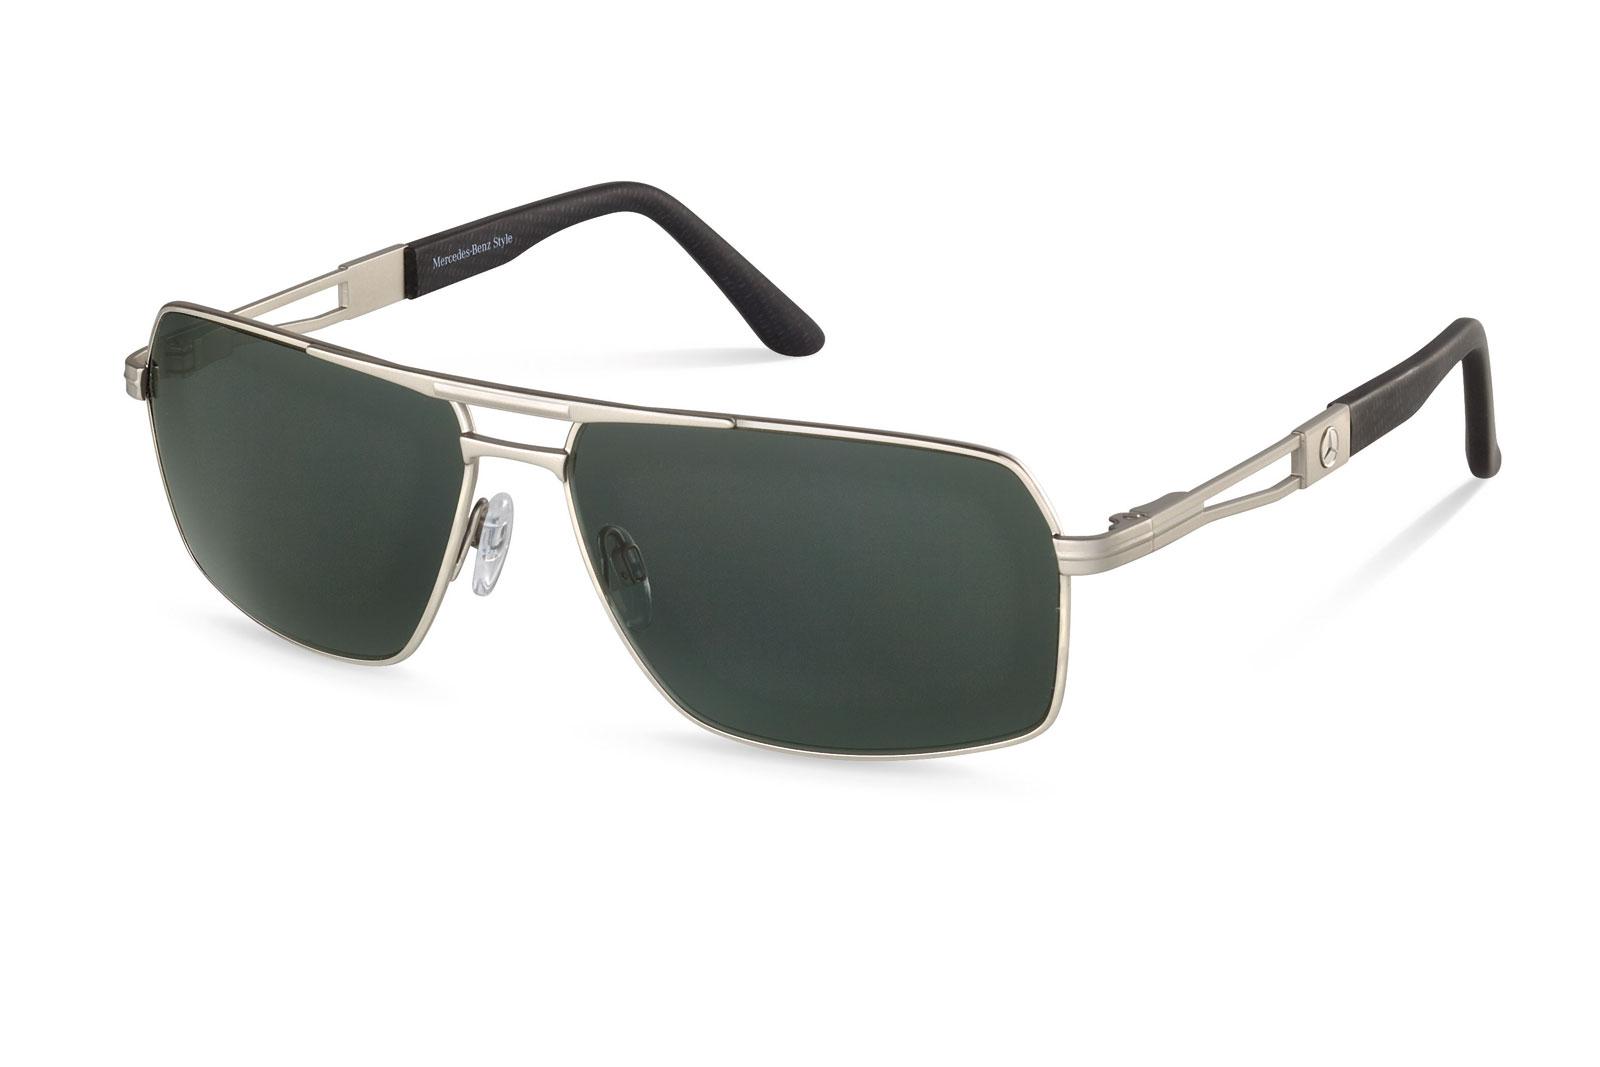 Mercedes benz style eyewear collection car body design for Mercedes benz sunglasses